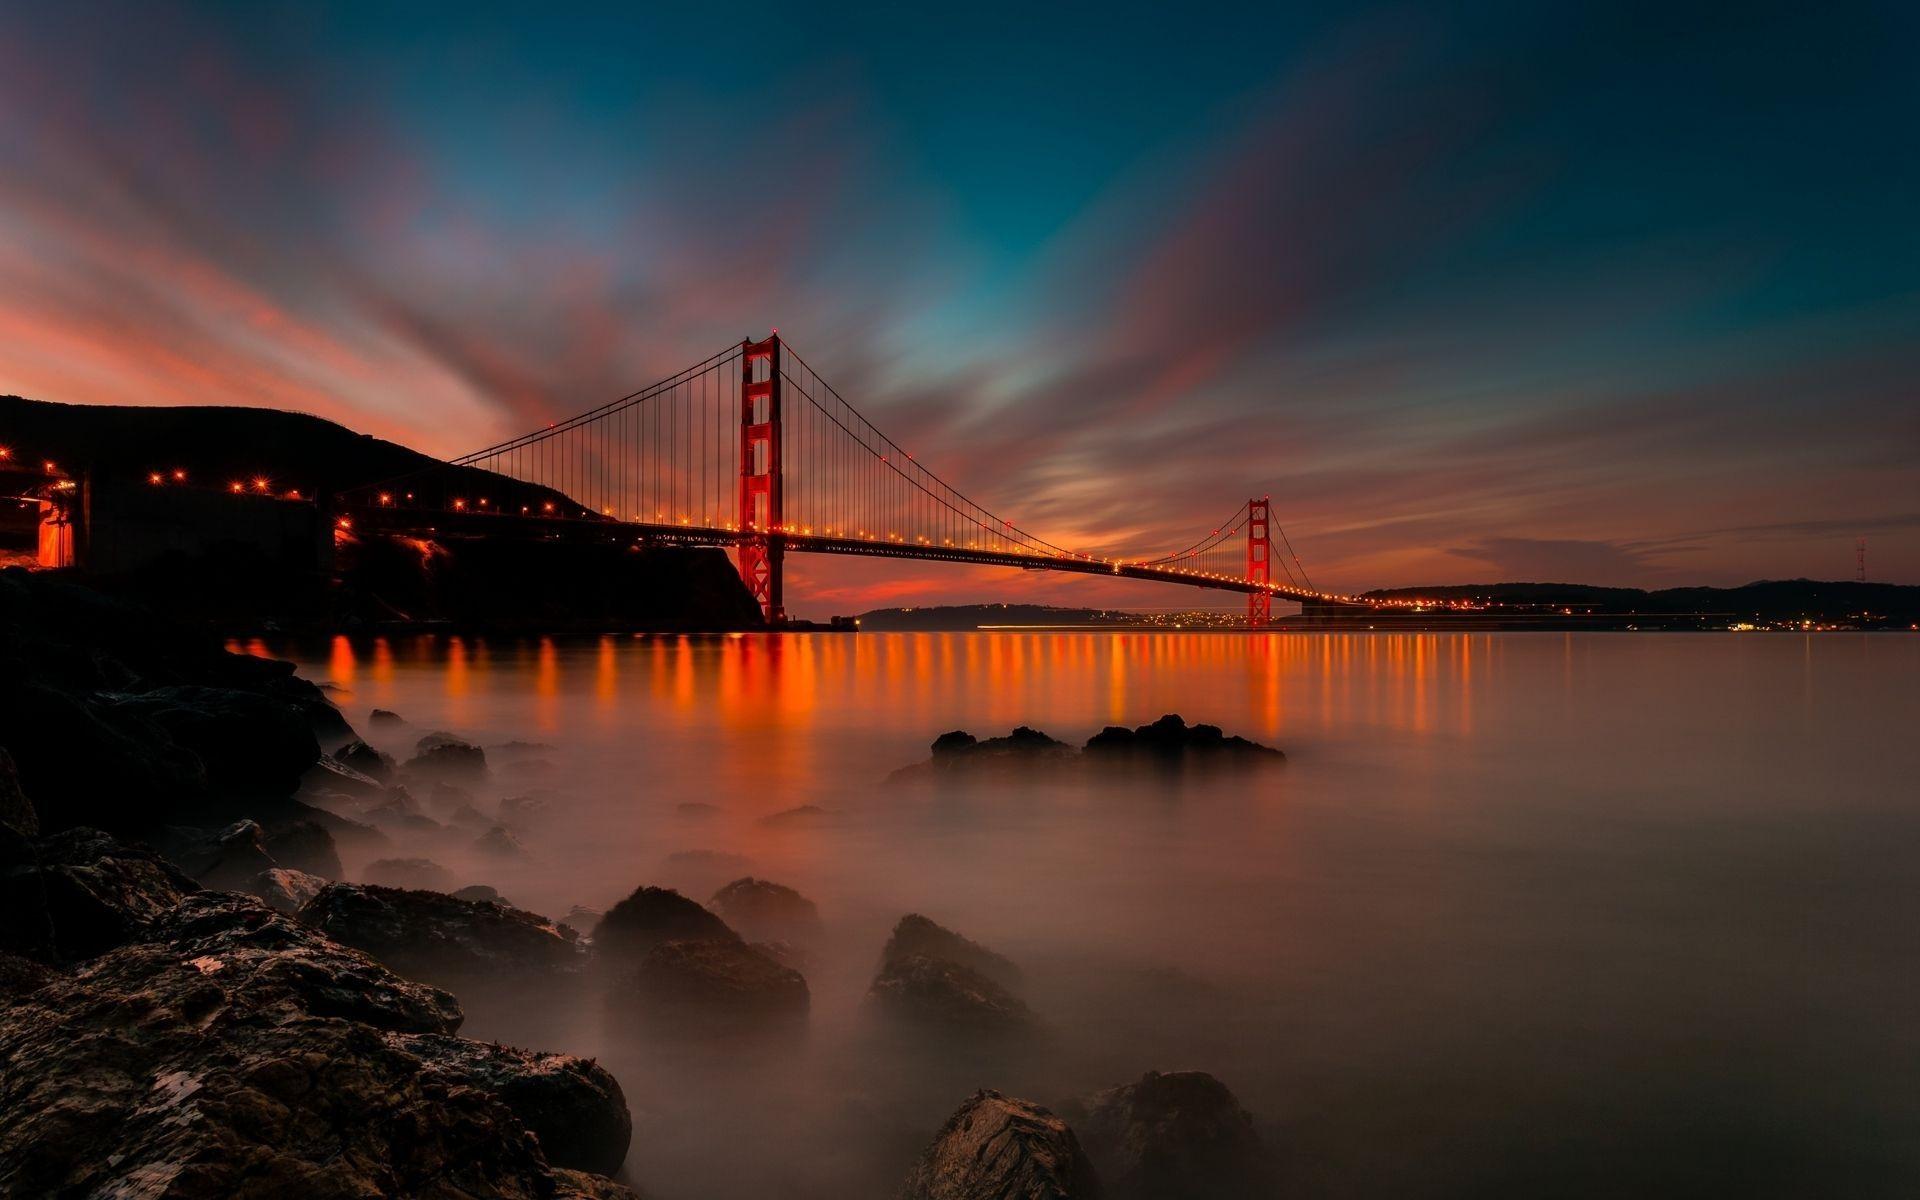 Top Wallpaper Macbook San Francisco - 74202-san-francisco-wallpaper-1920x1200-hd-for-mobile  You Should Have_464516.jpg